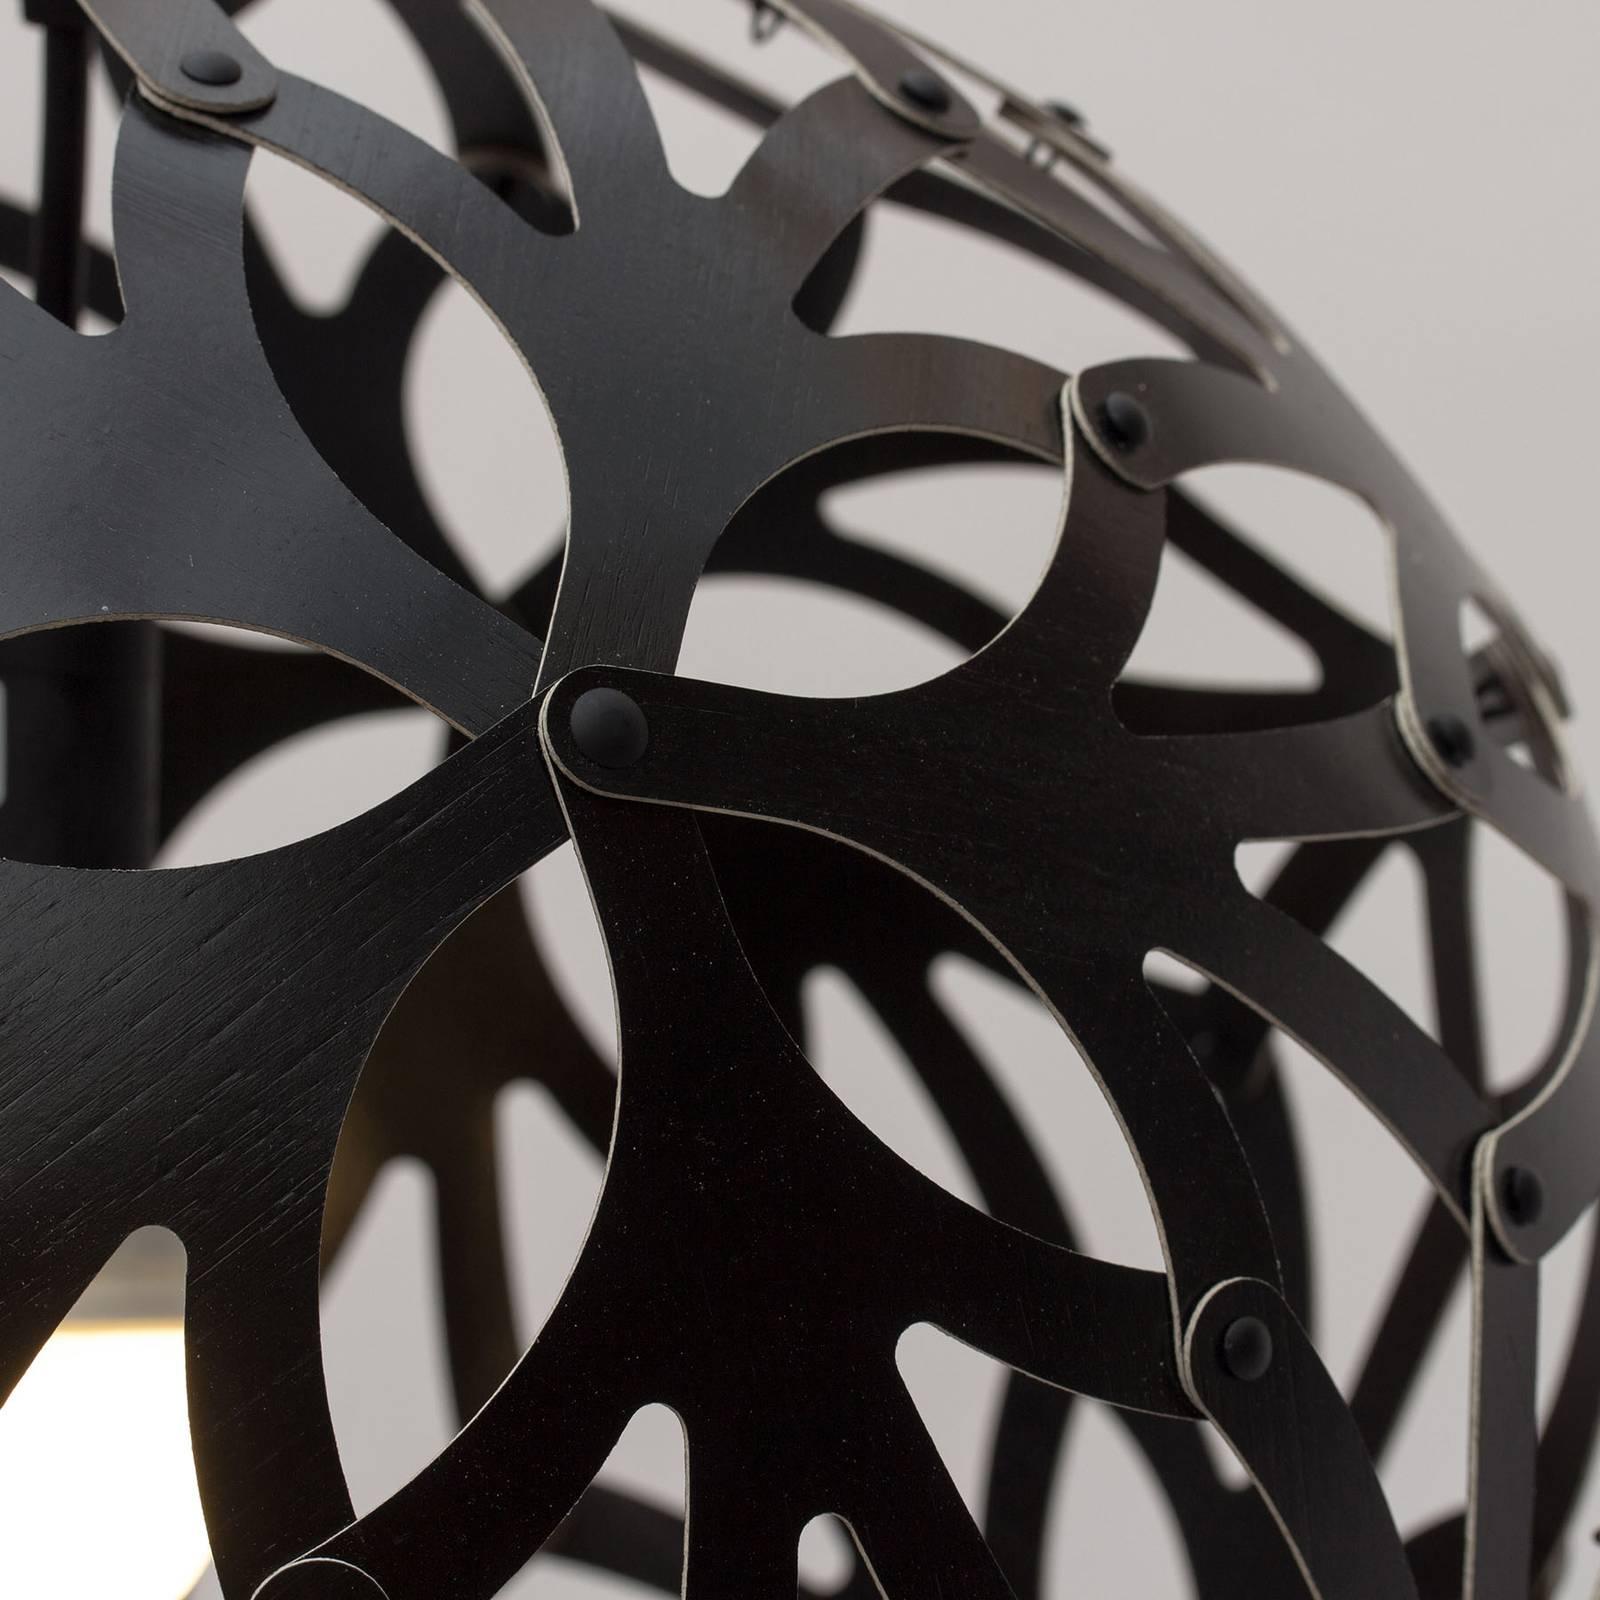 david trubridge Floral -riippuvalo Ø 60 cm musta